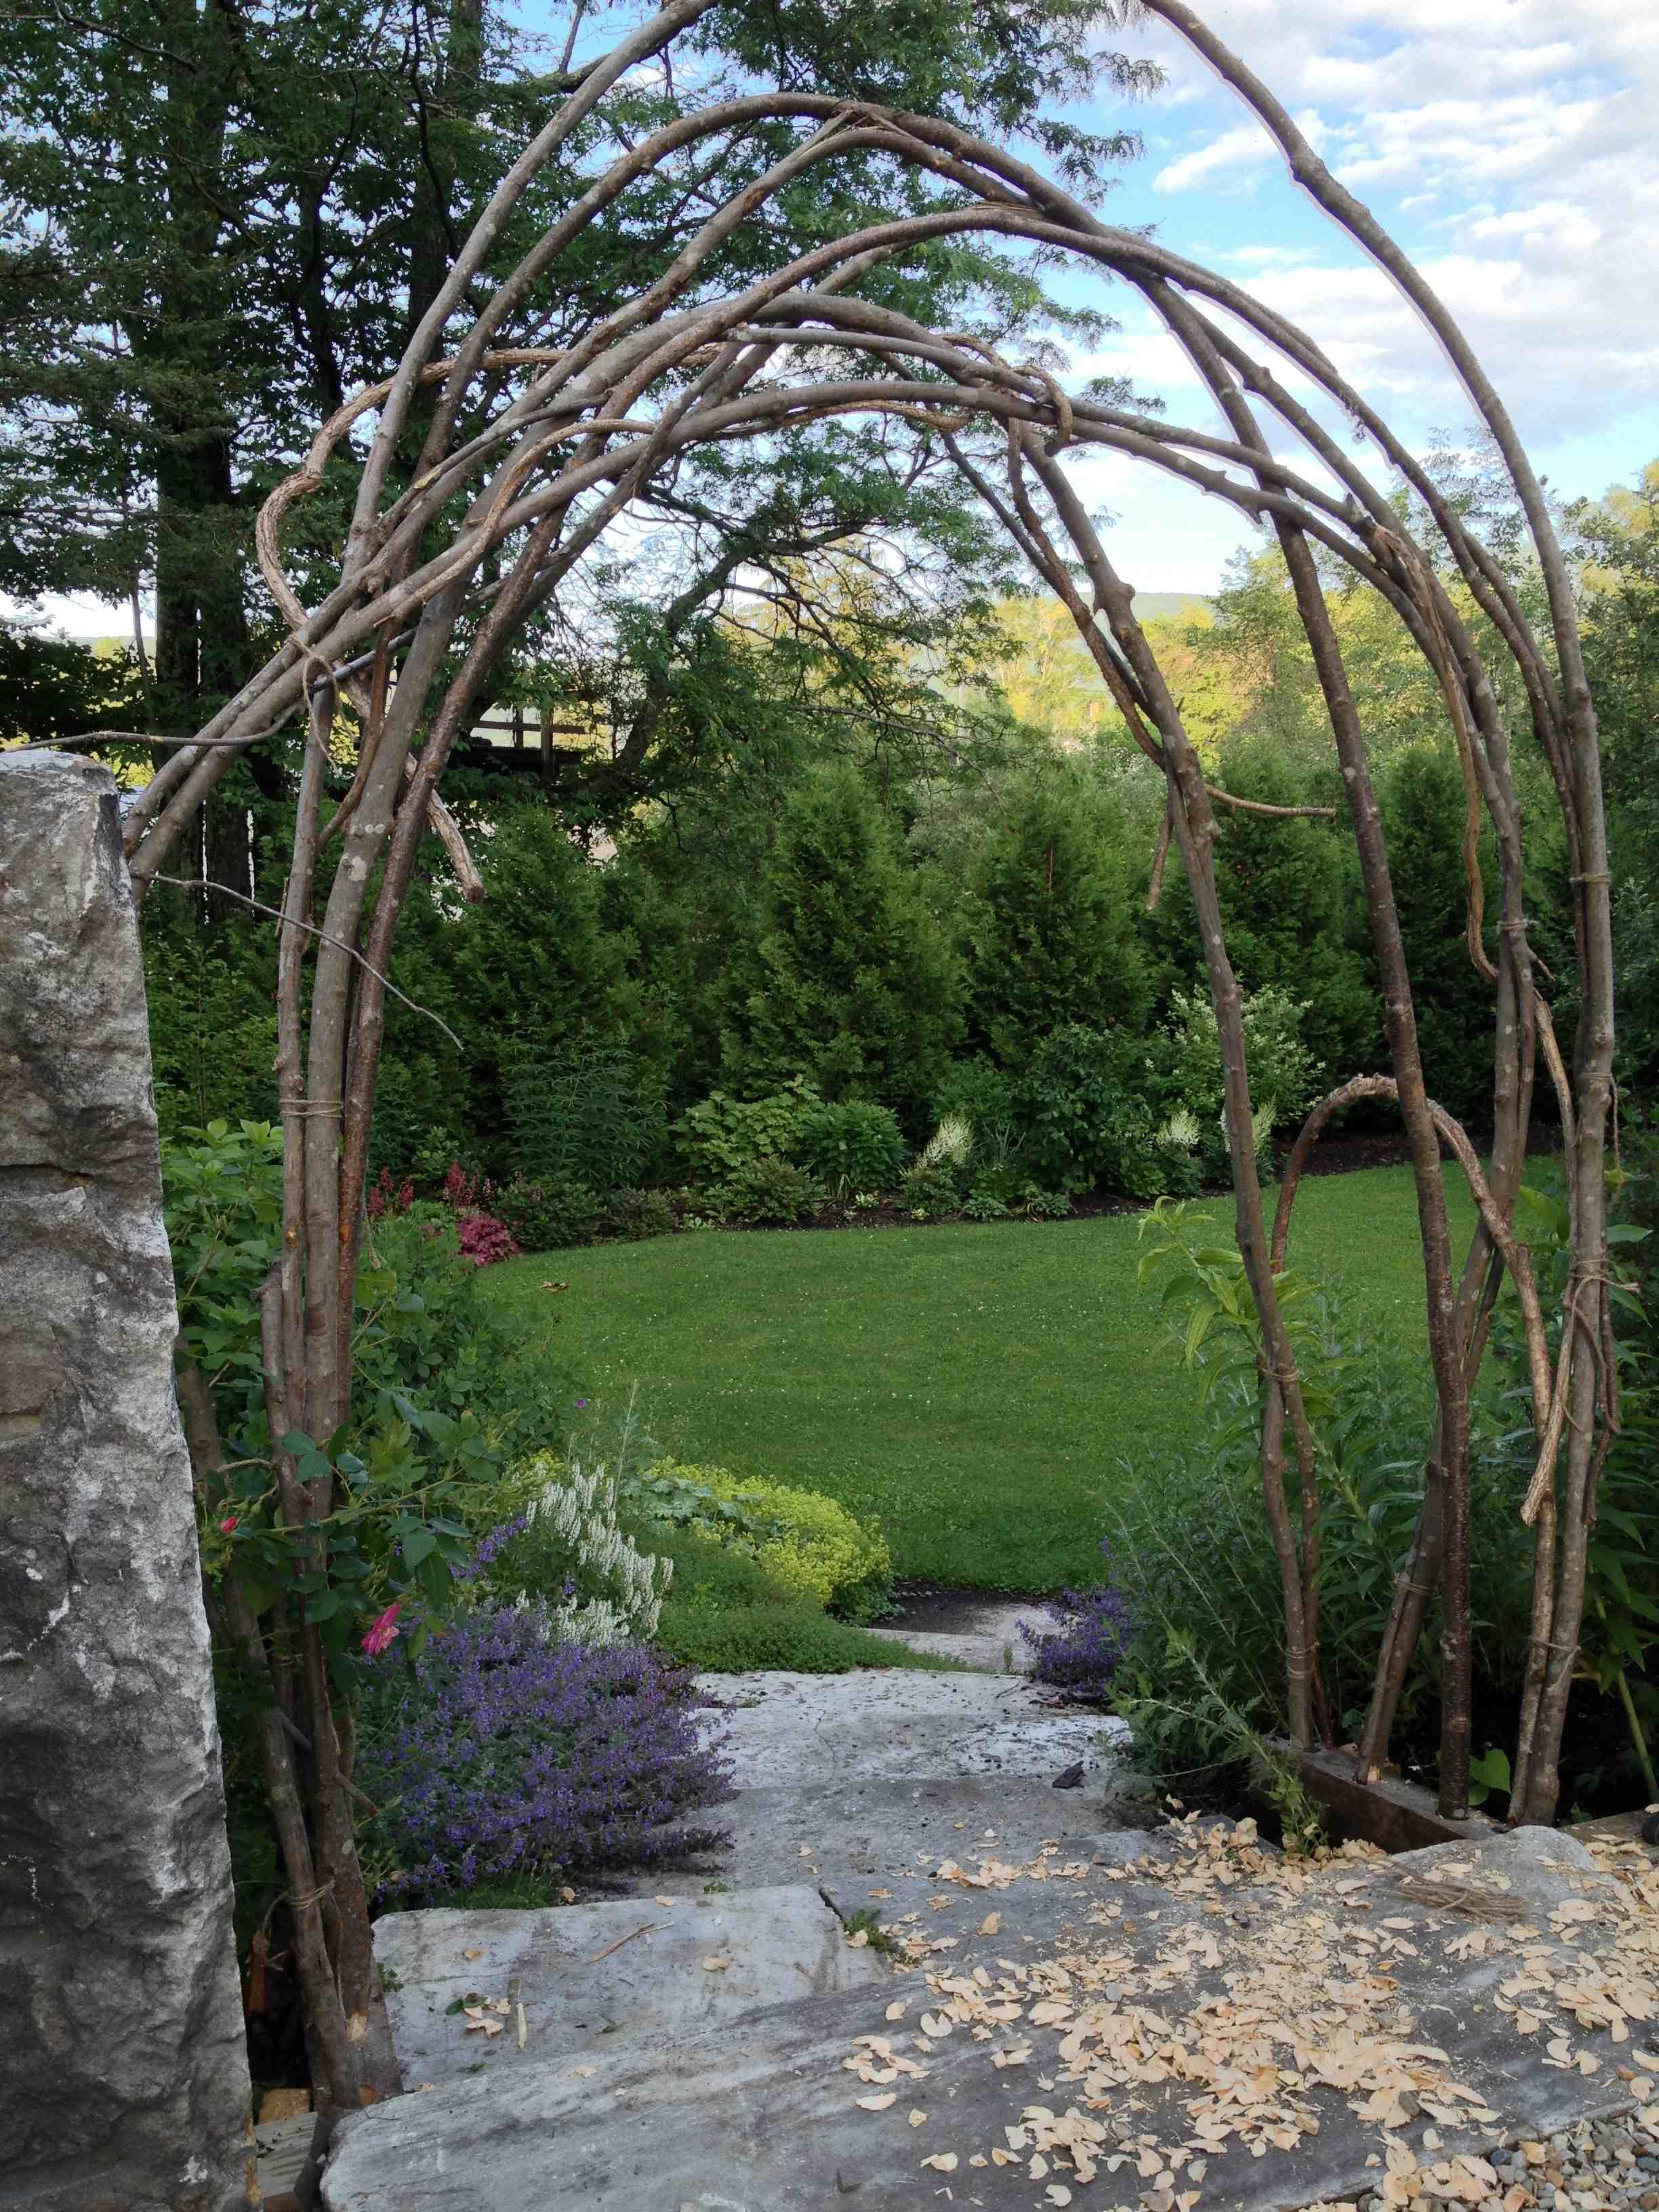 How To Build A Rustic Trellis Ellen Ecker Ogden